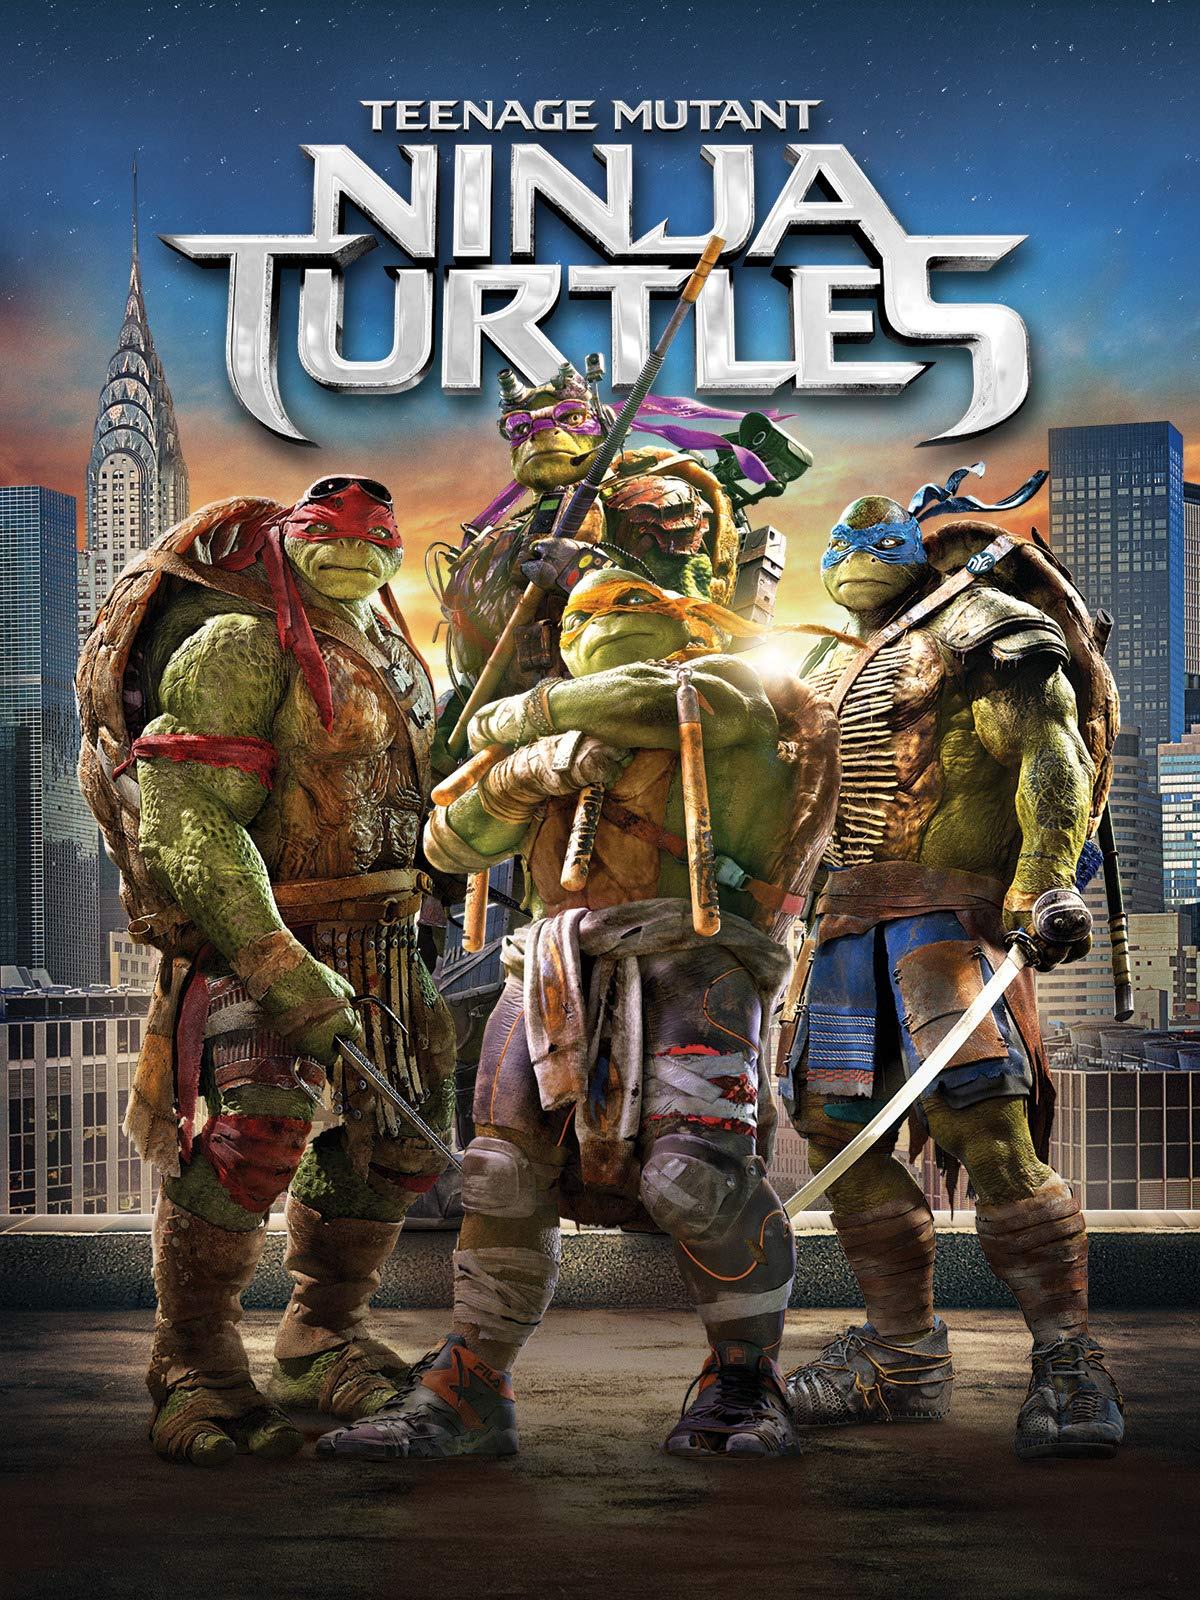 Watch Teenage Mutant Ninja Turtles (2014) (4K UHD) | Prime Video